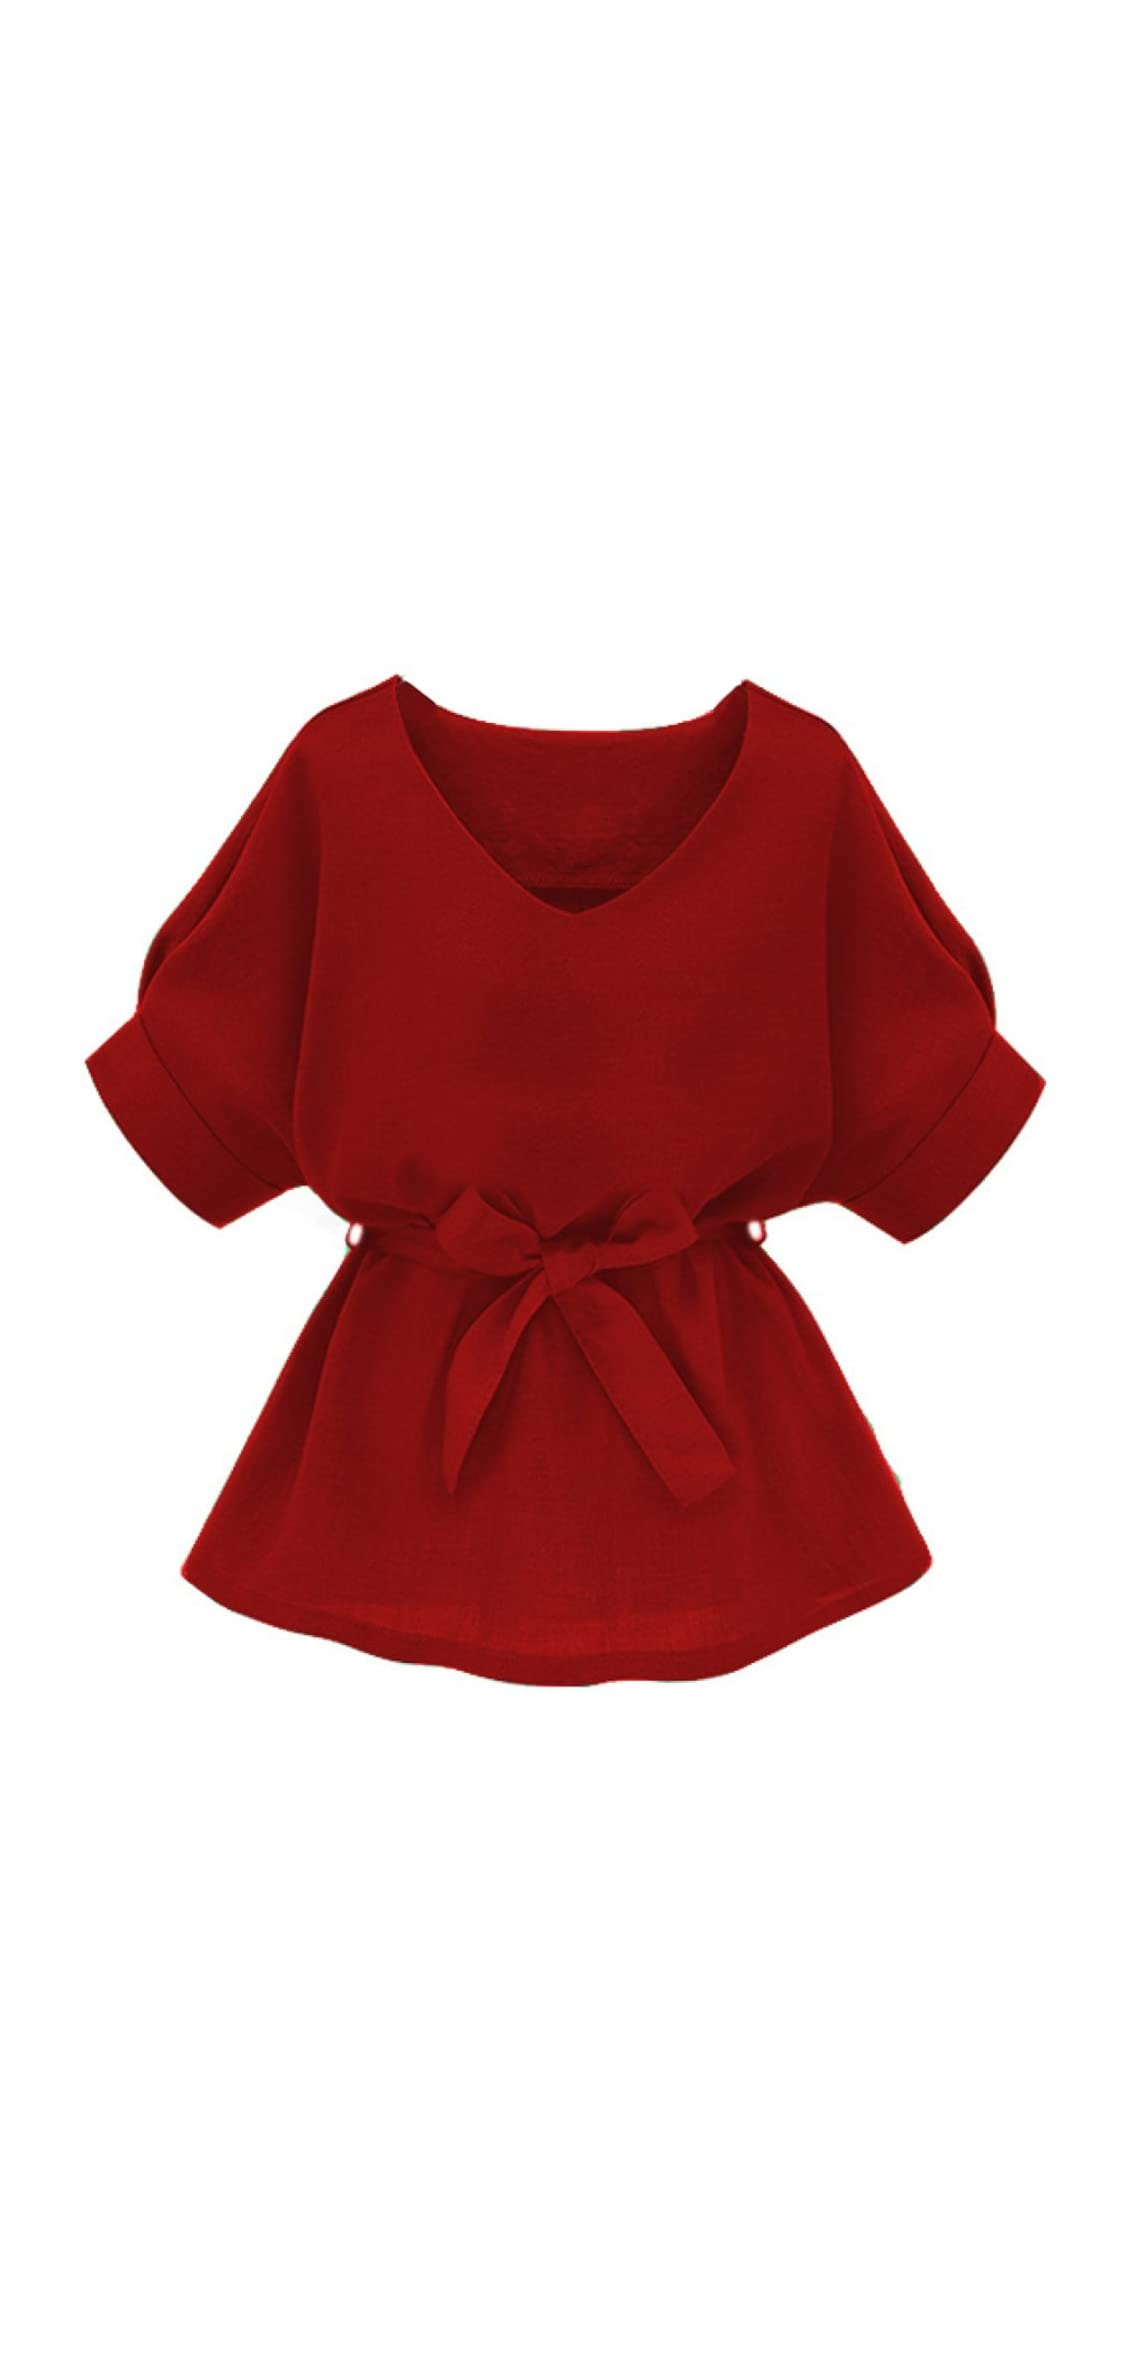 Women's V Neckline Self Tie Short Sleeve Blouse Tunic